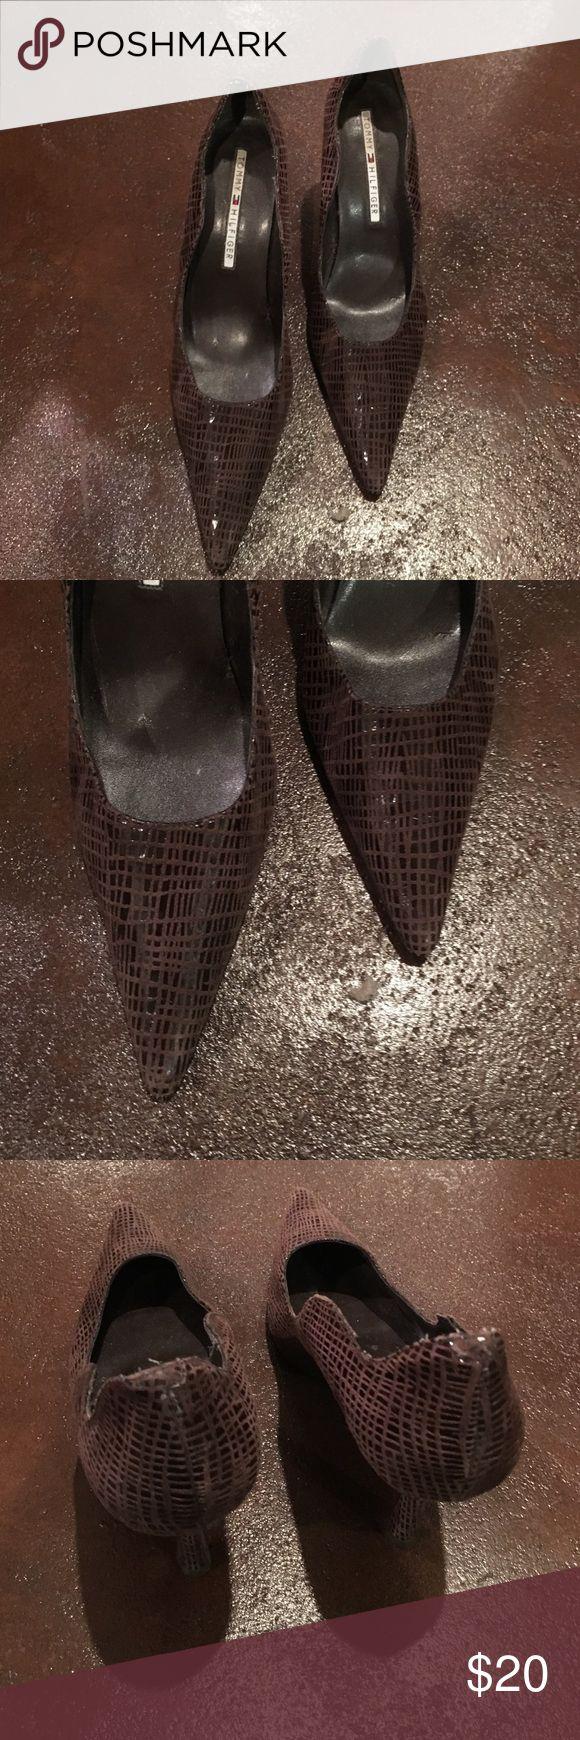 "Tommy Hilfiger brown 3.5"" pumps, 8.5 Tommy Hilfiger brown pattern 3.5"" pumps, 8.5, like new Tommy Hilfiger Shoes Heels"